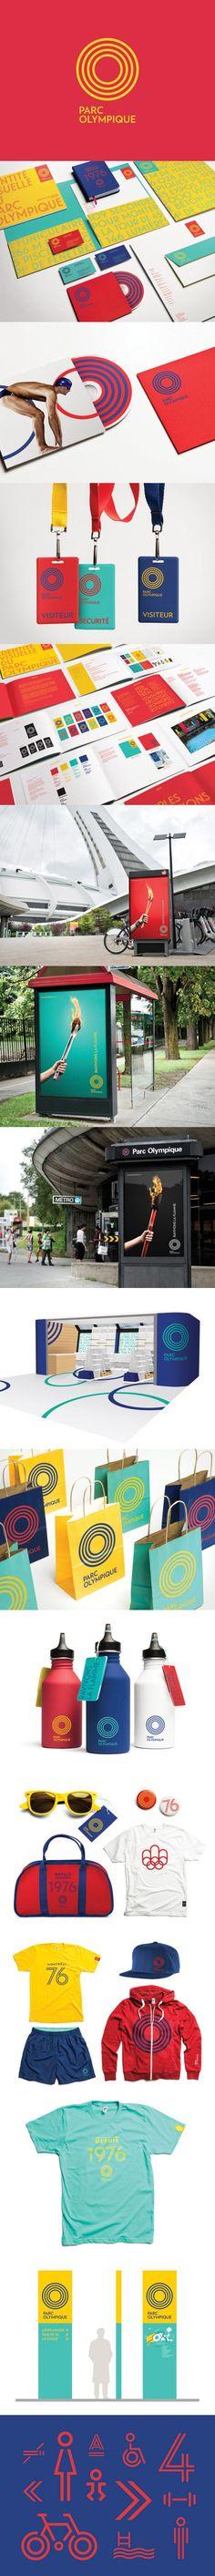 Montréal Olympic Park identity by lg2 #identity #branding #colors